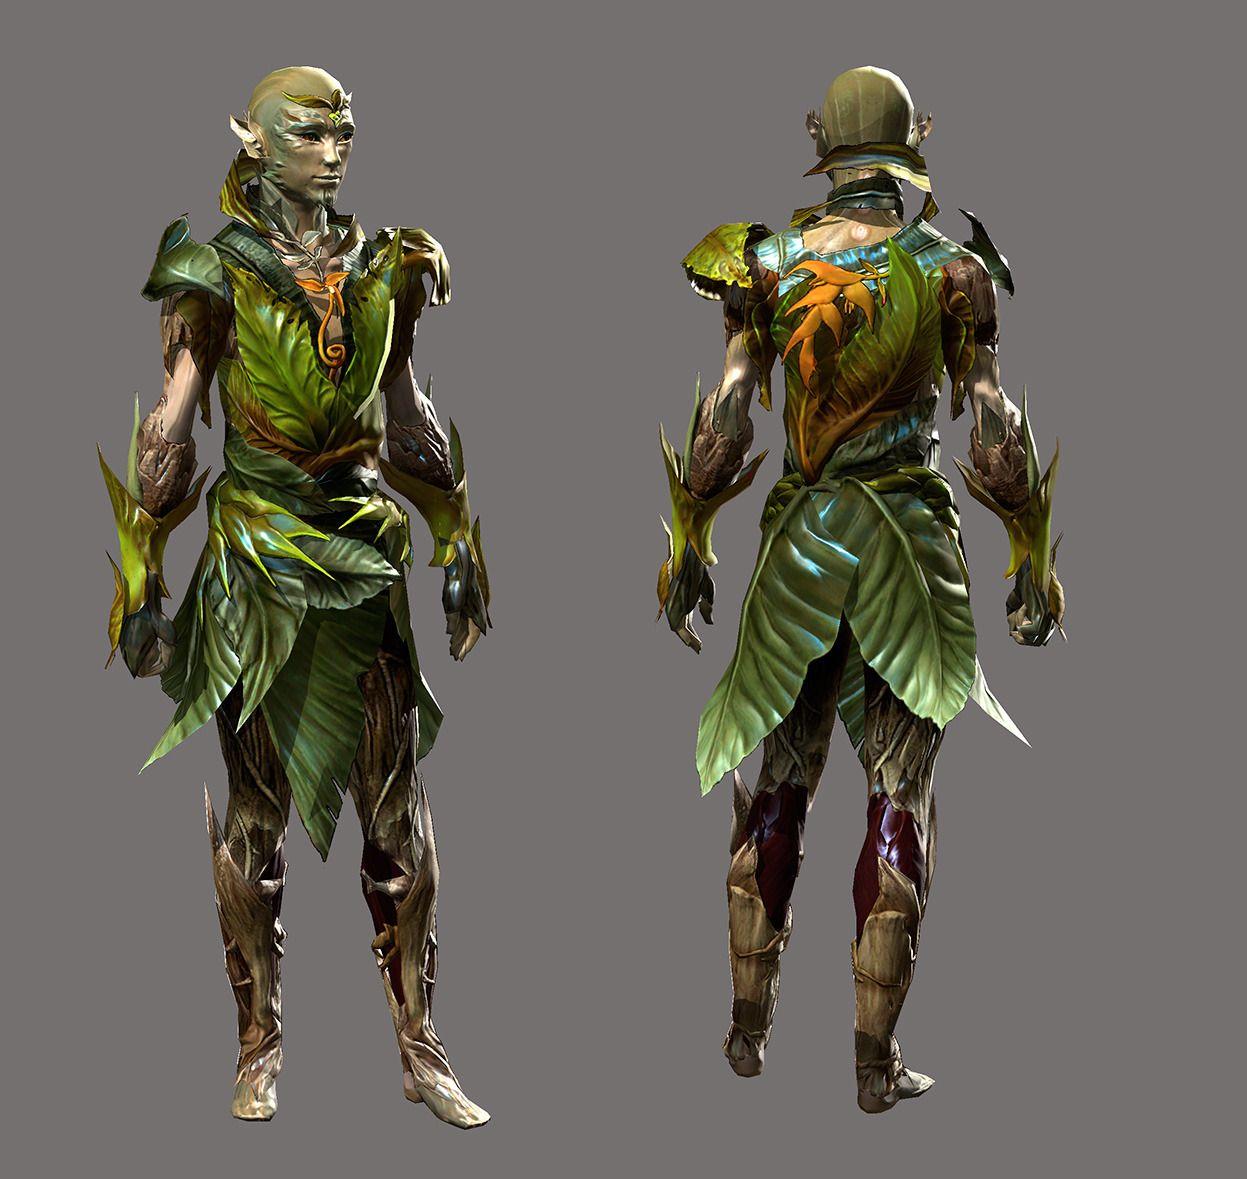 Sylvari Armor – Guild Wars 2 armor | Armor & Outfit ...